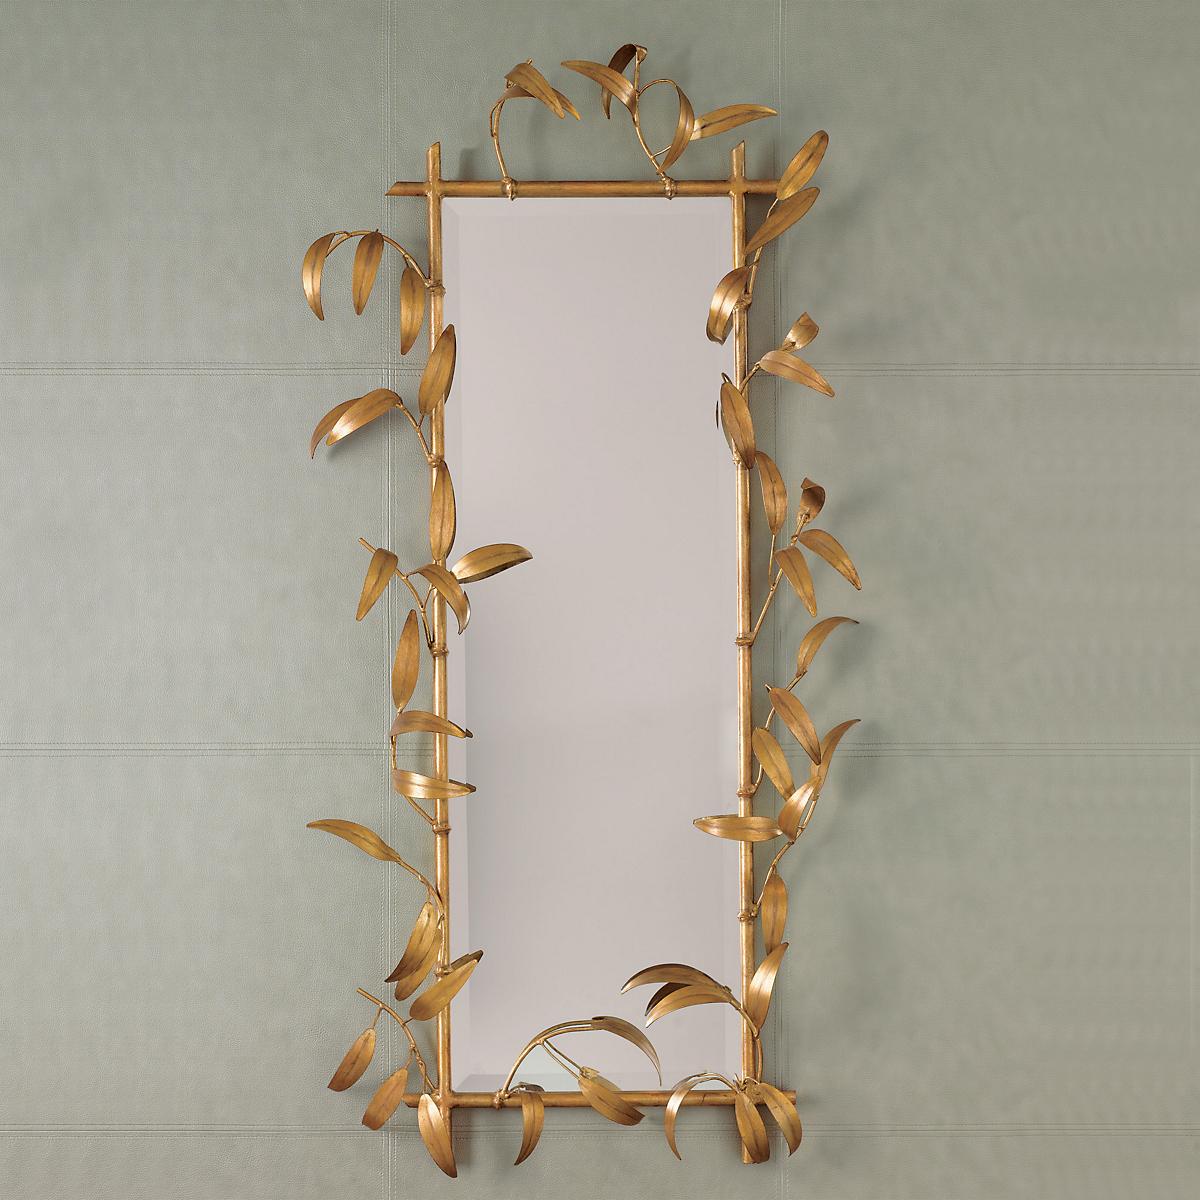 goldleafed bamboo mirror